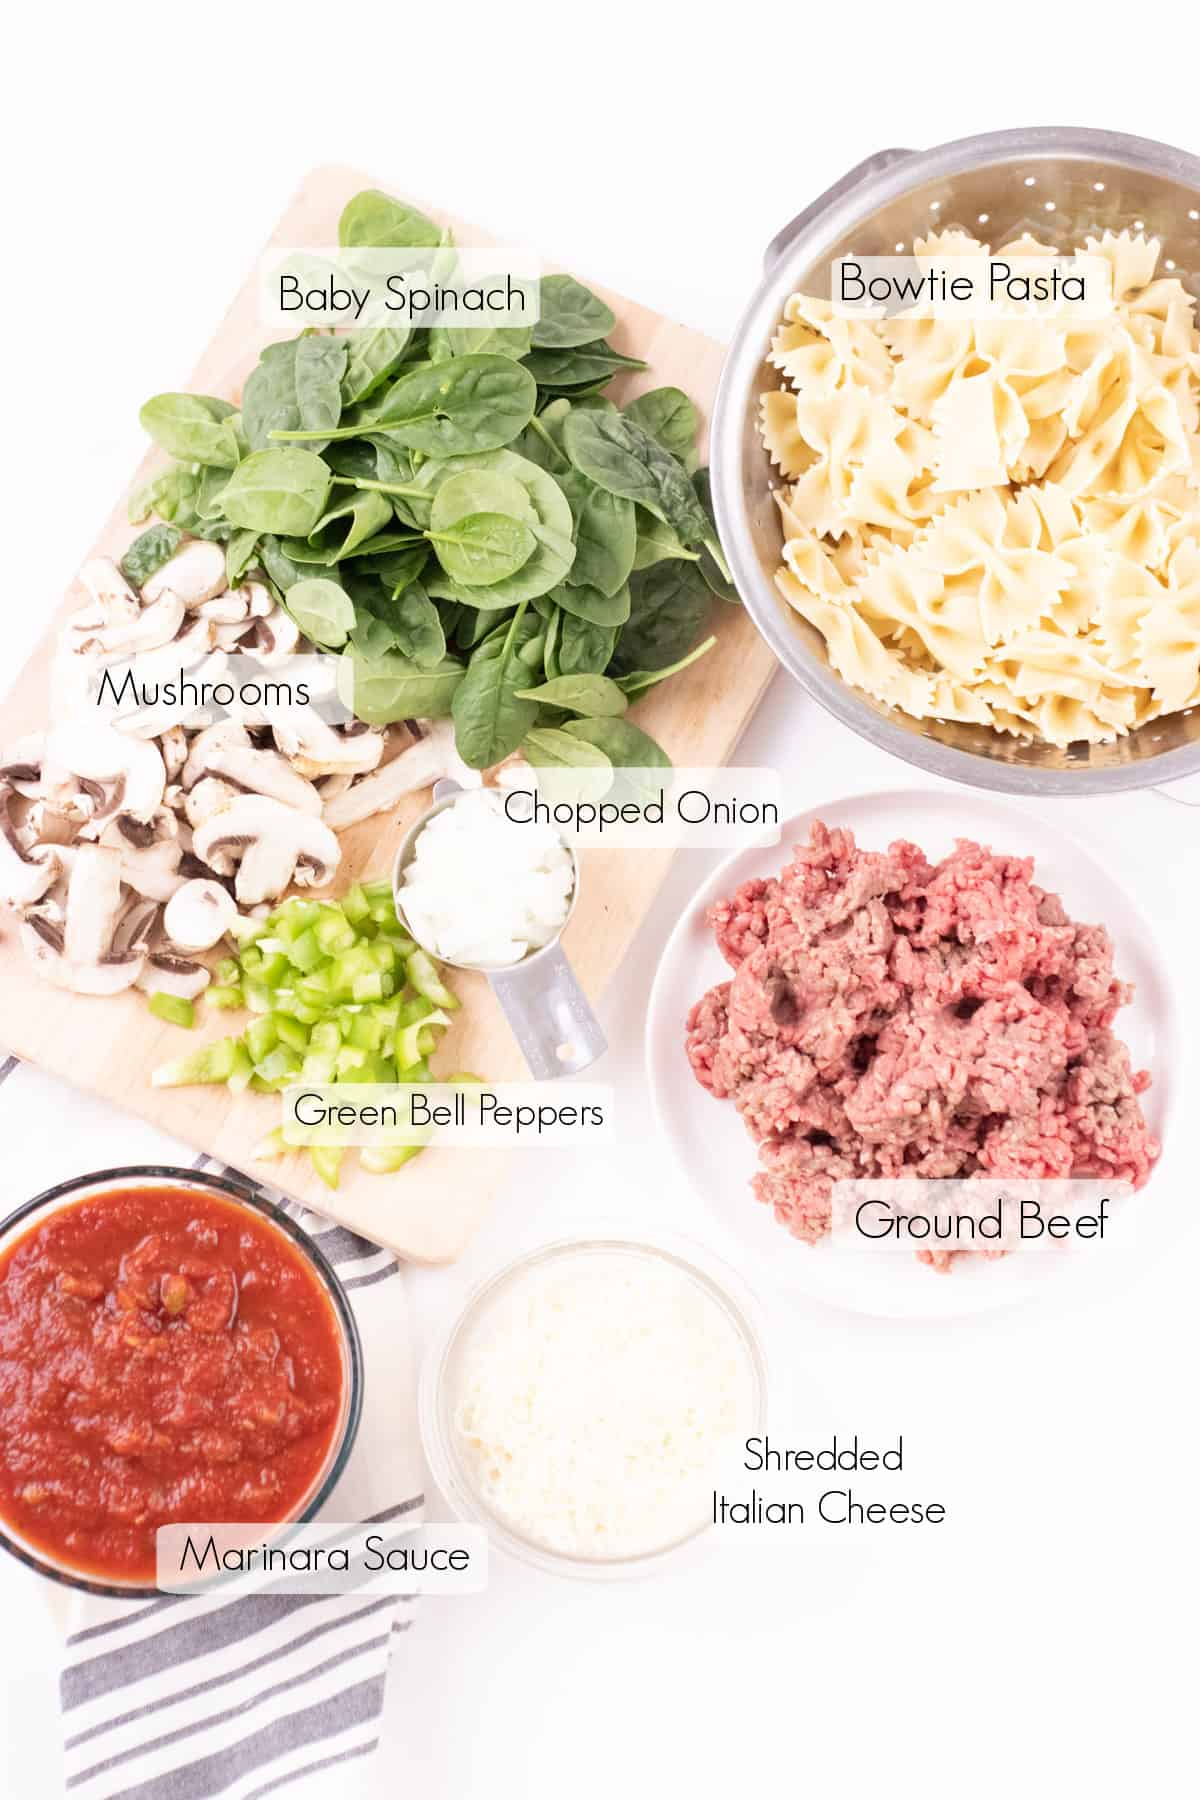 Labeled ingredients to make skillet stovetop lasagna.